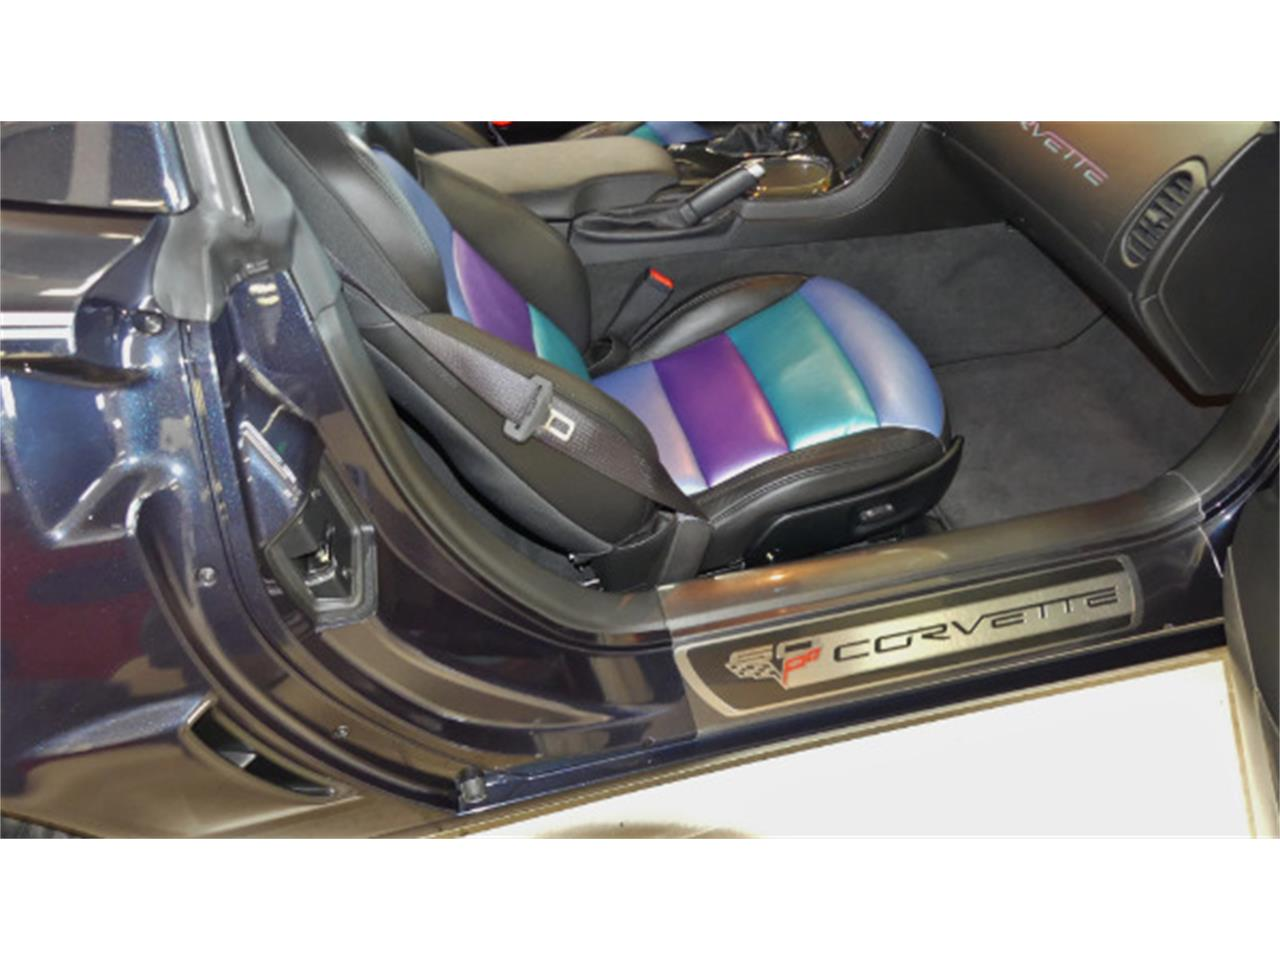 Large Picture of '13 Chevrolet Corvette - $45,895.00 - L3E0